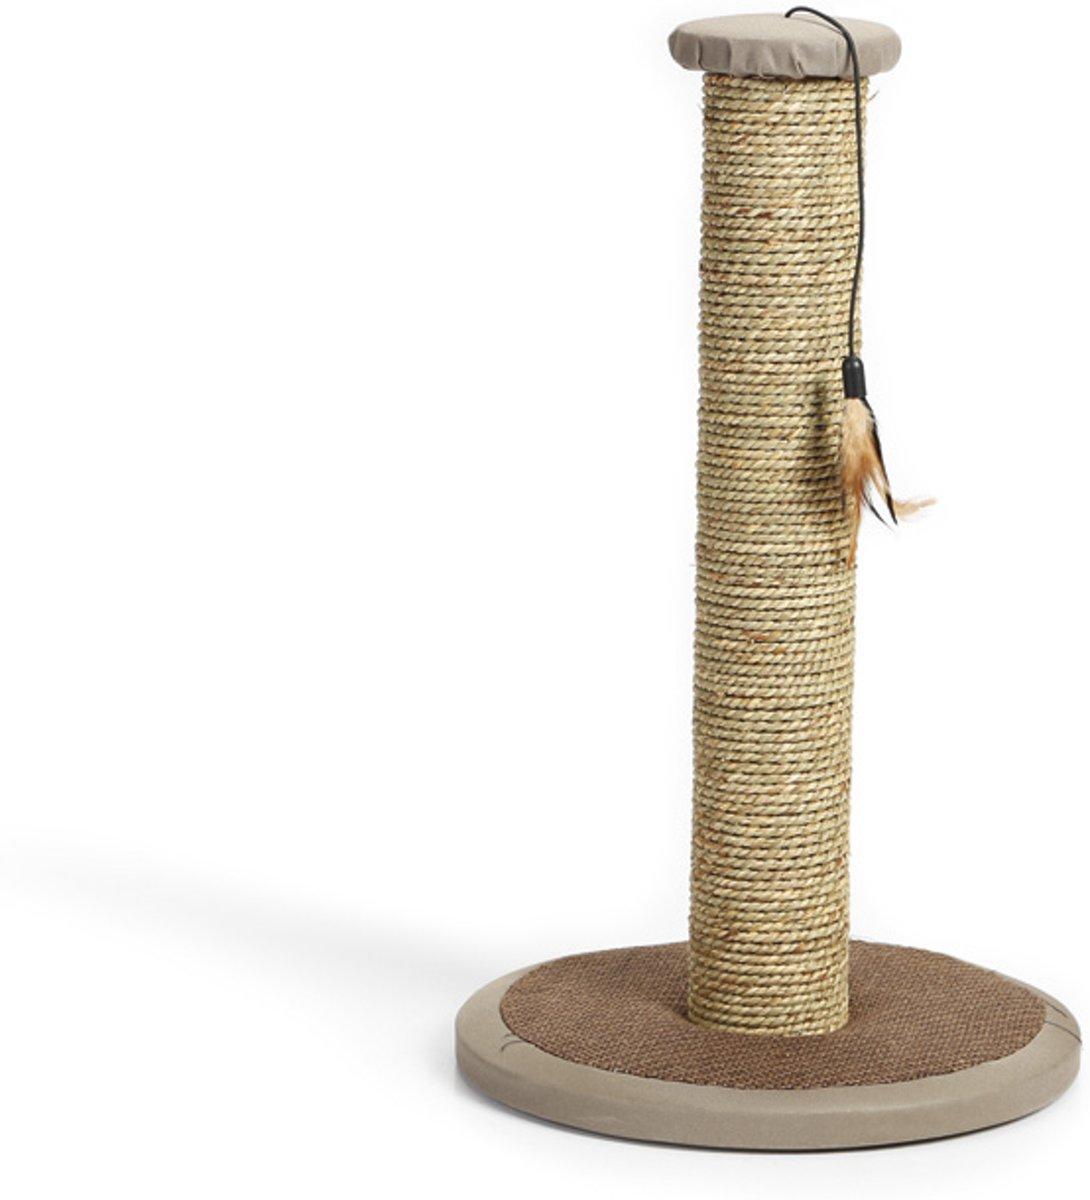 Krabpaal Rofra - Afmeting: 30x30x49cm